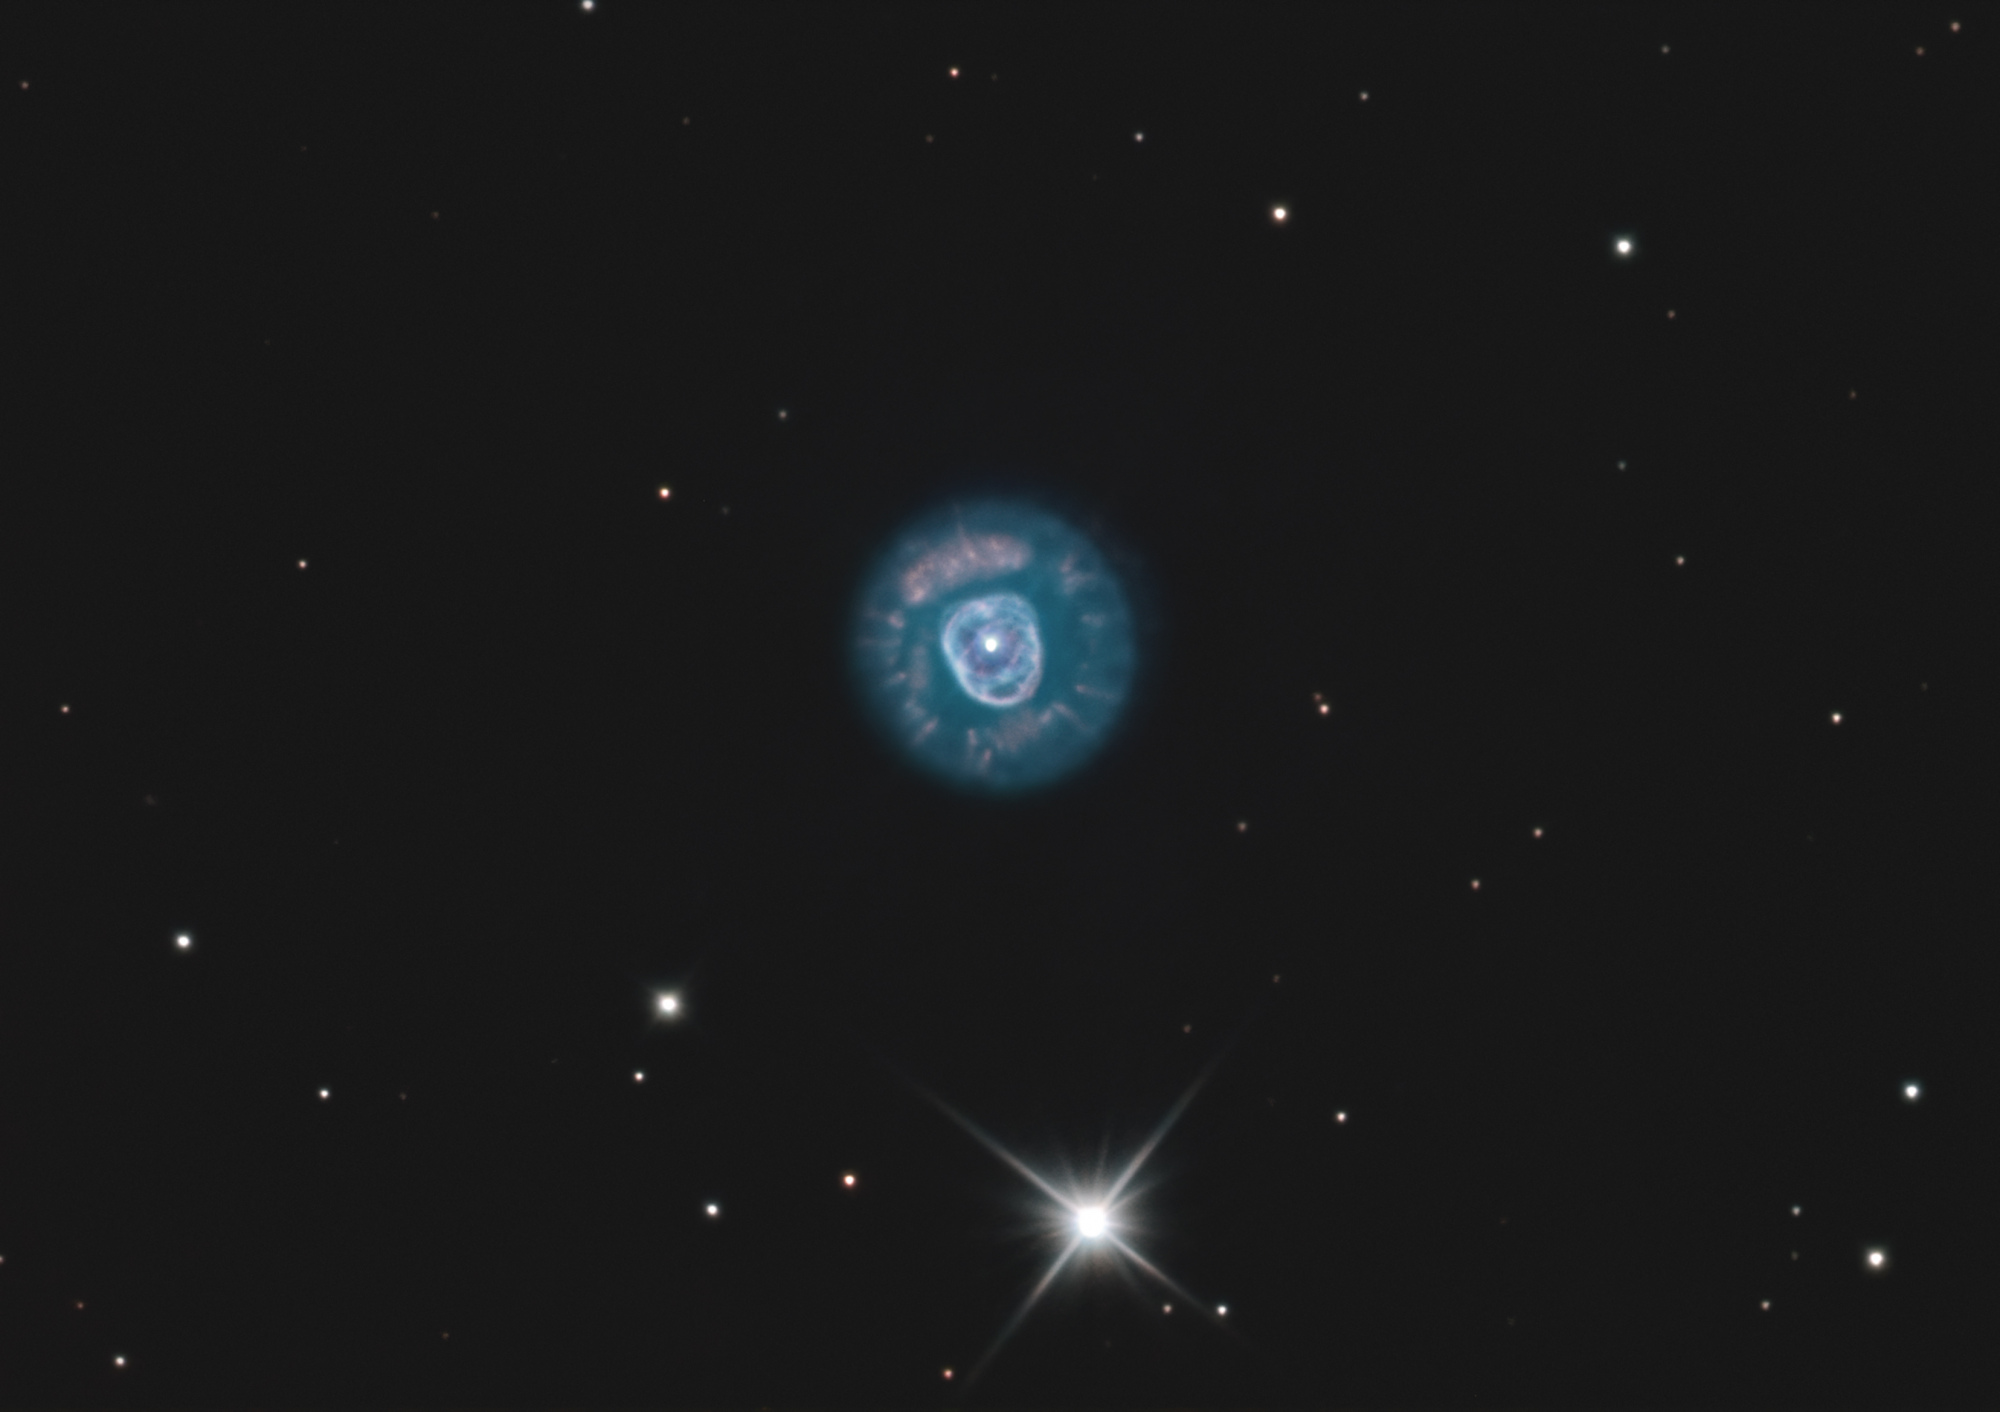 NGC-2392_final.jpg.c34332e132057bf6f0def70a29e56cbe.jpg